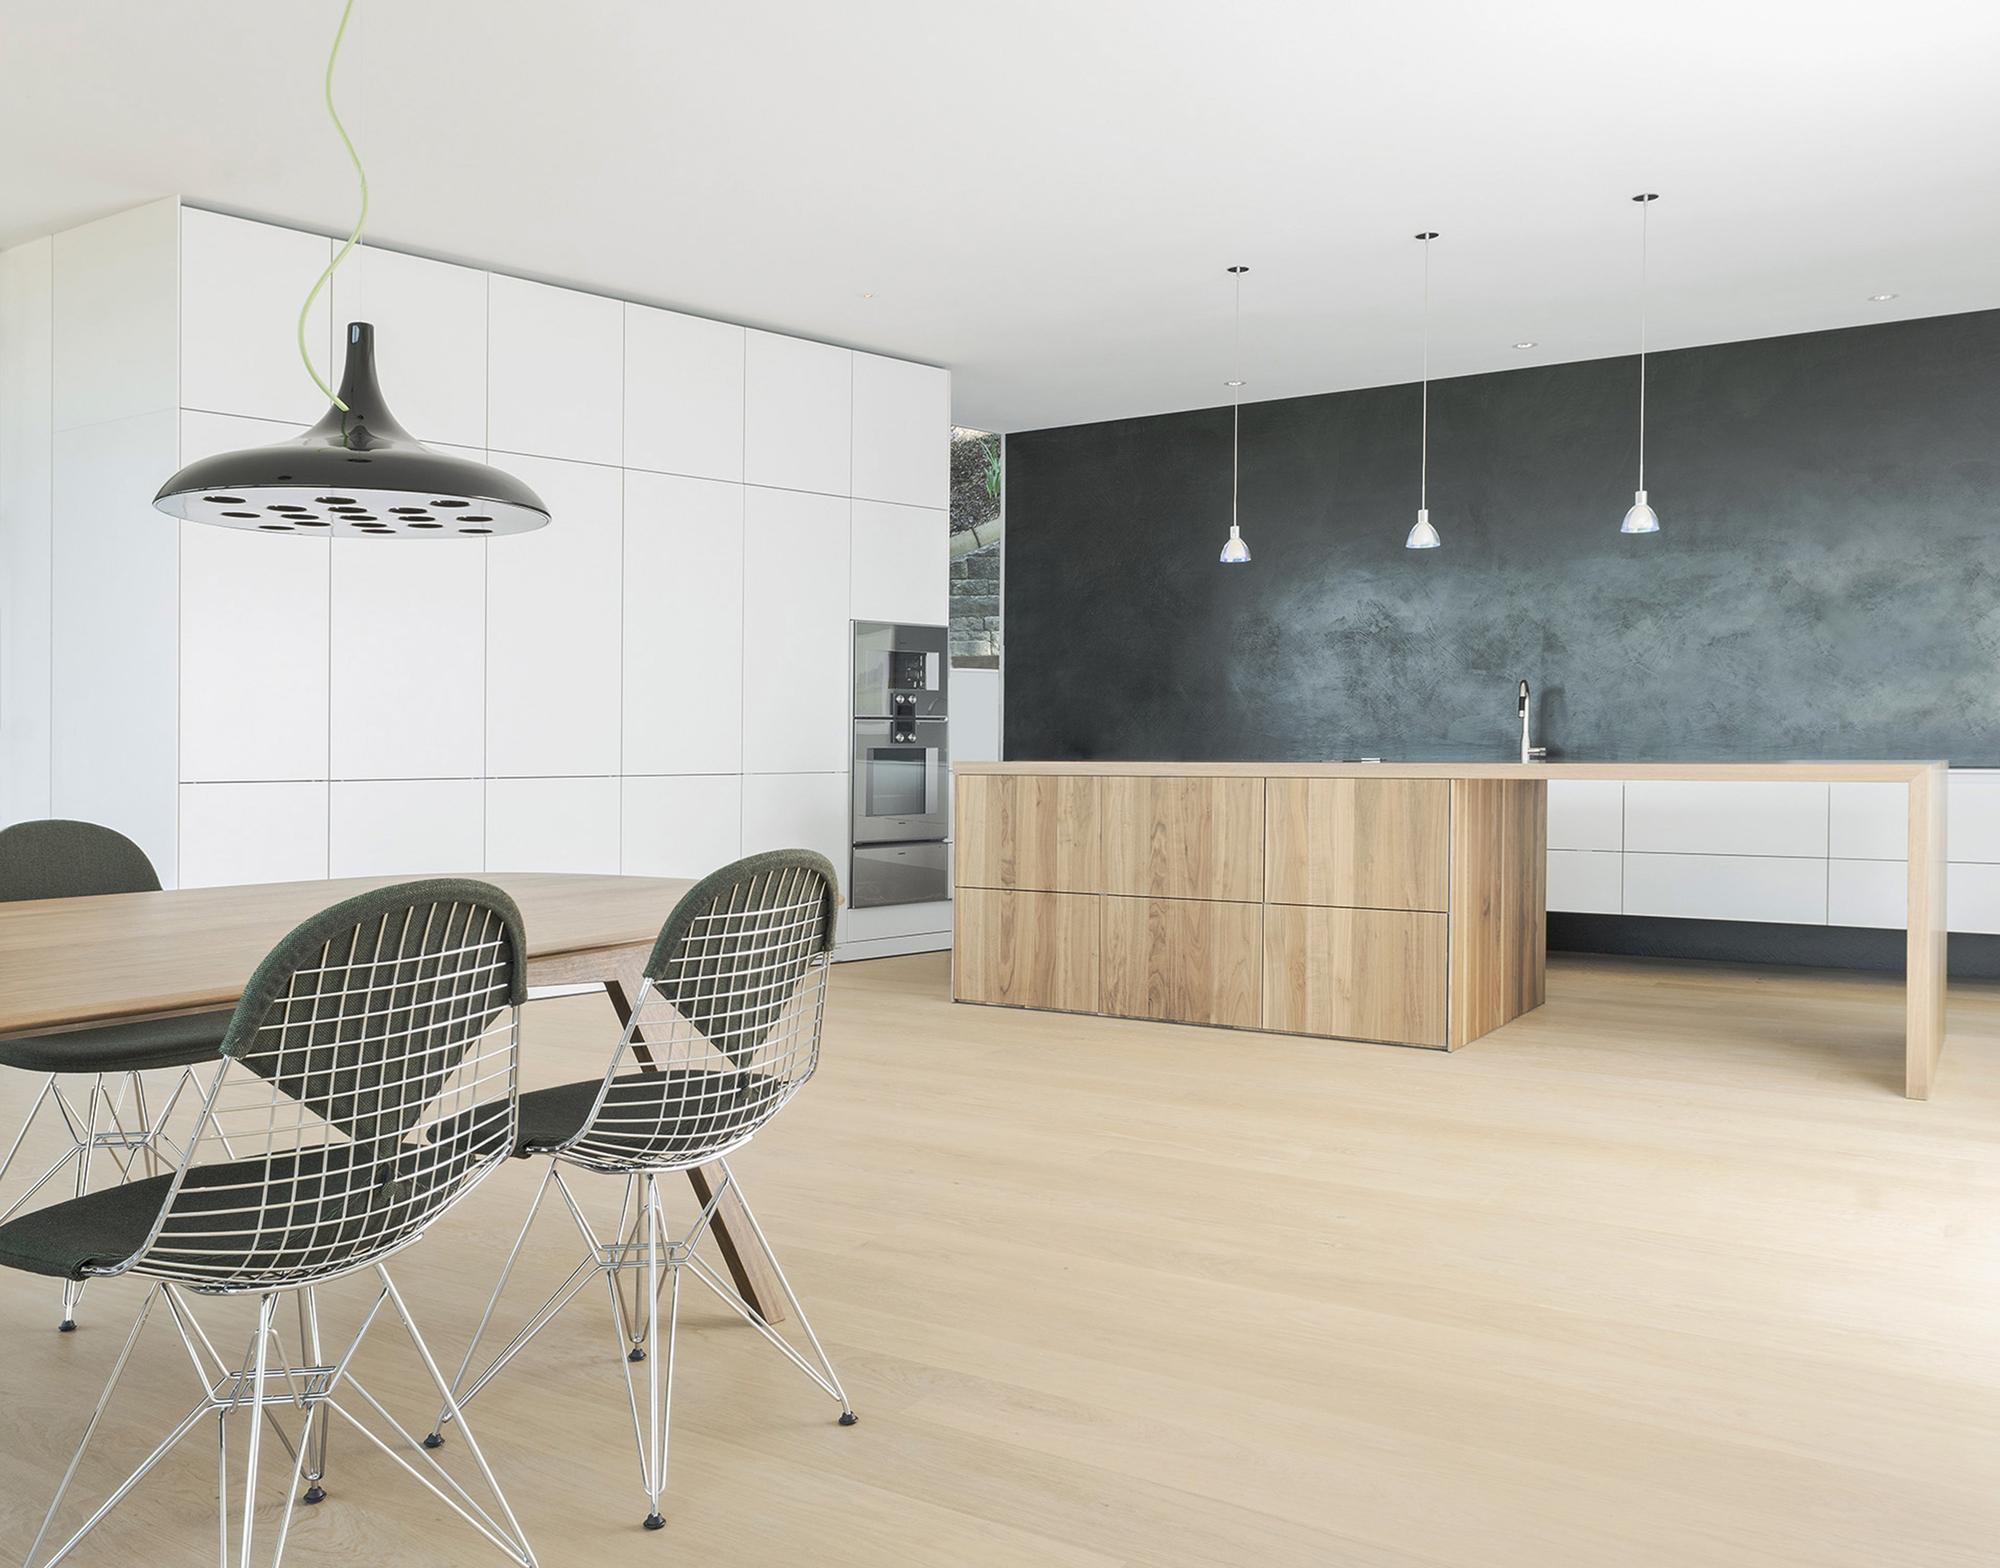 galer a de haus b yonder architektur und design 7. Black Bedroom Furniture Sets. Home Design Ideas